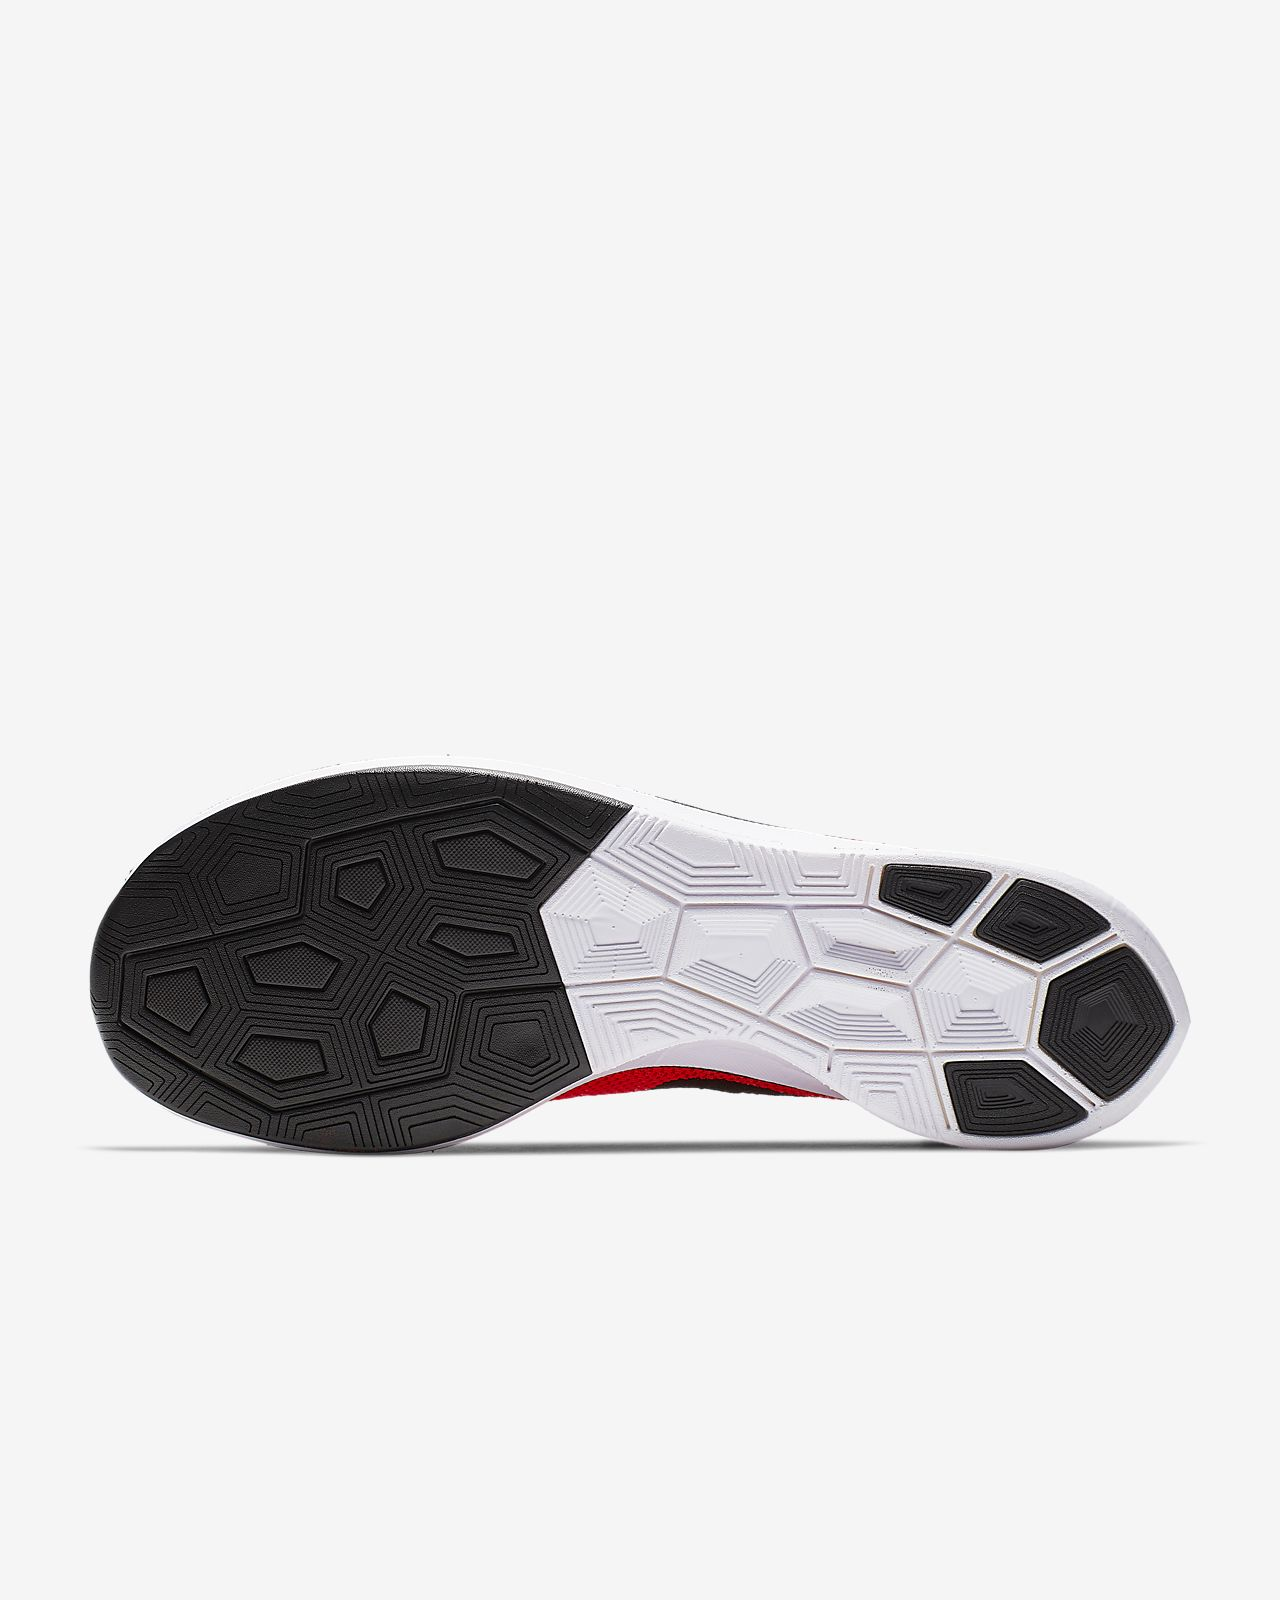 zapatillas nike vaporfly hombre